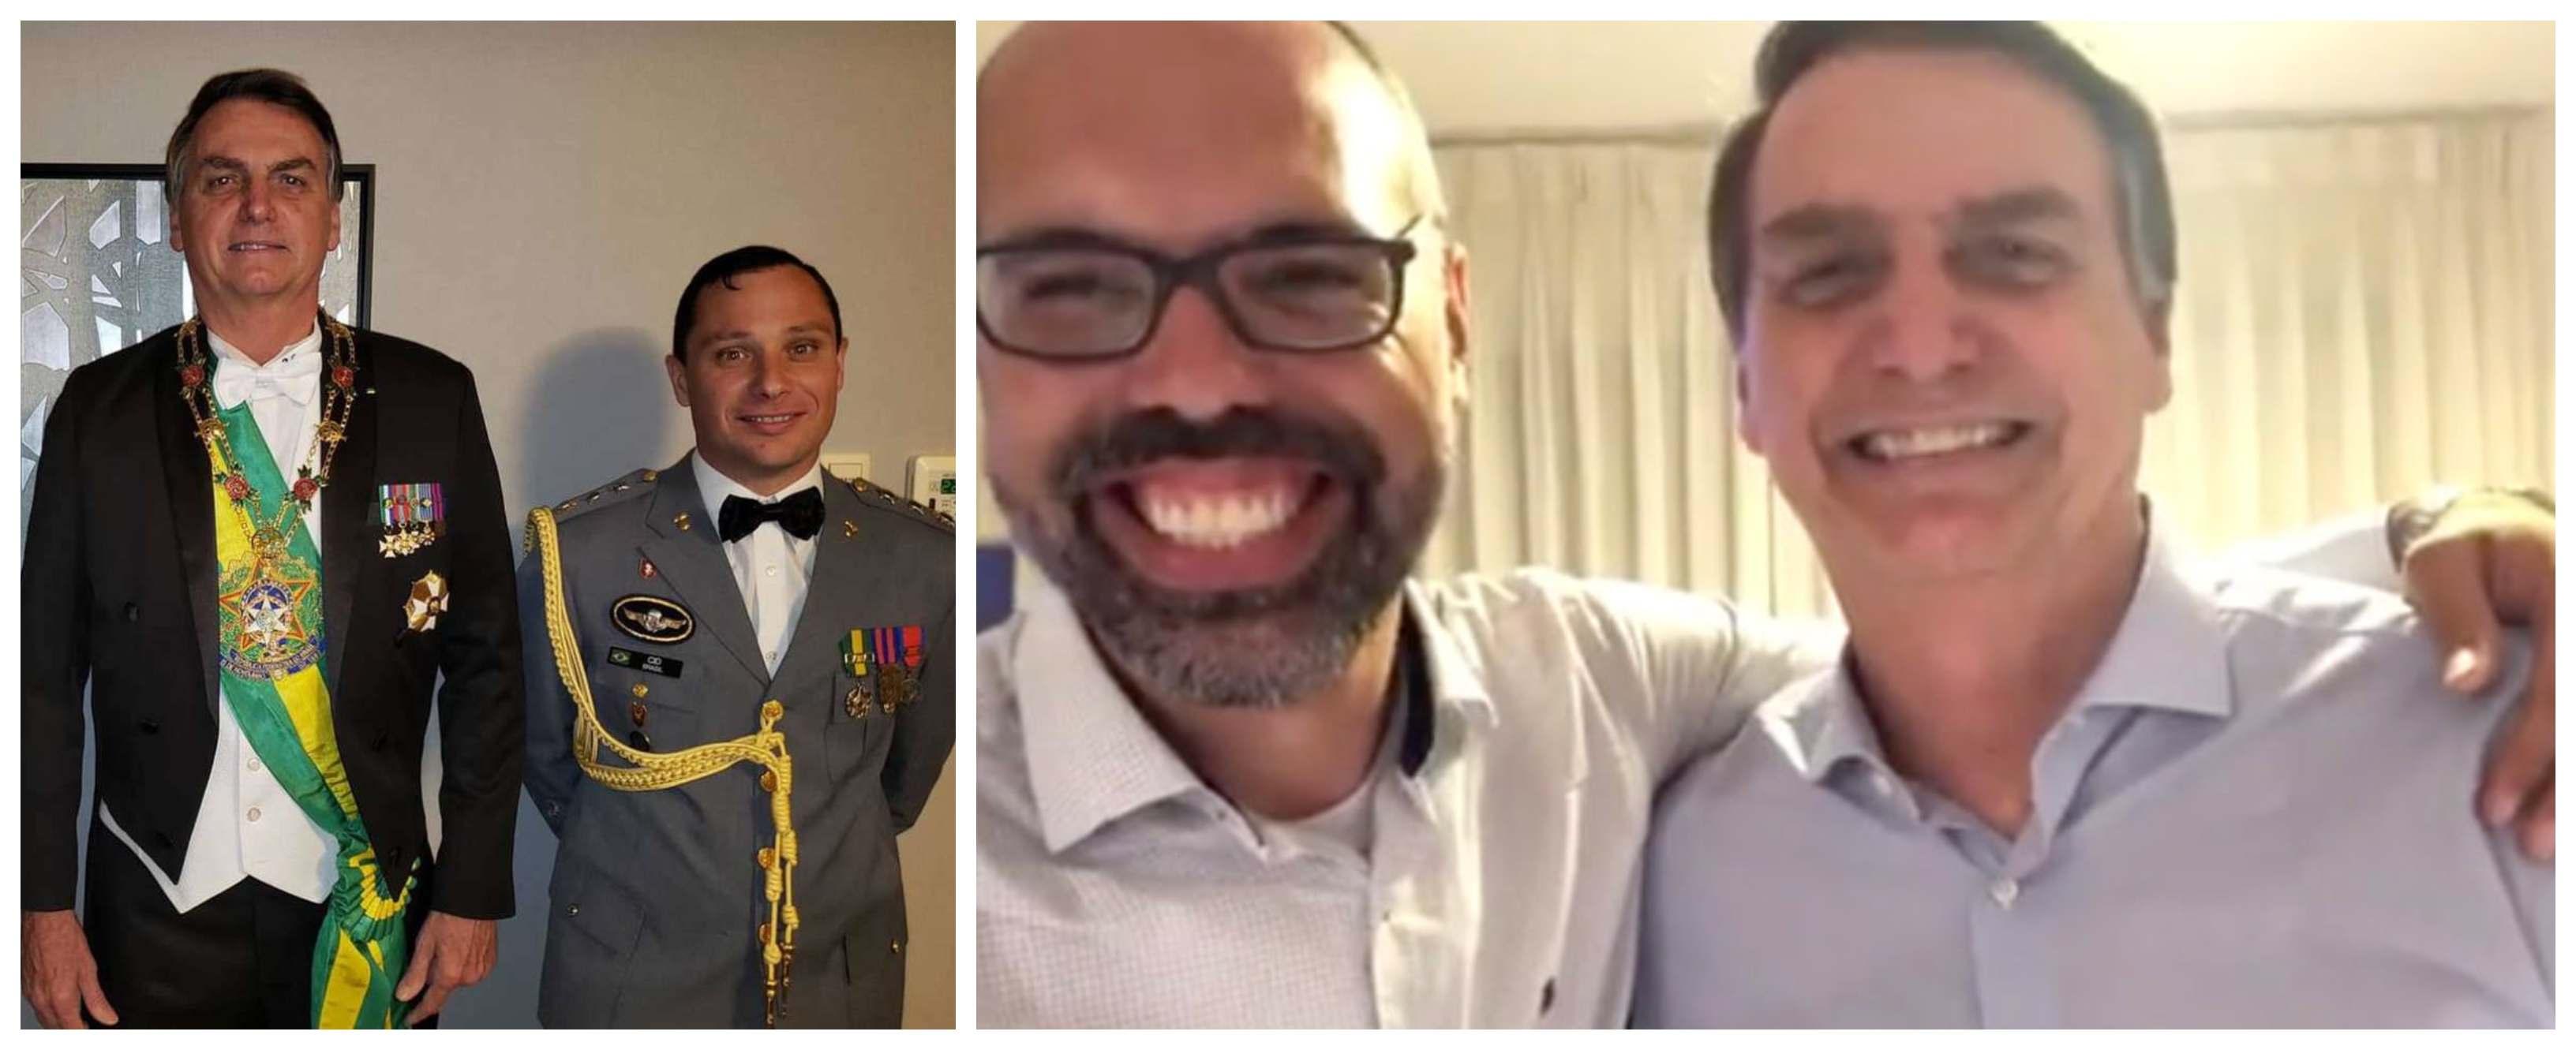 Coronel assessor de Bolsonaro diz à PF ser 'leva e traz' do blogueiro do ódio Allan dos Santos ao presidente